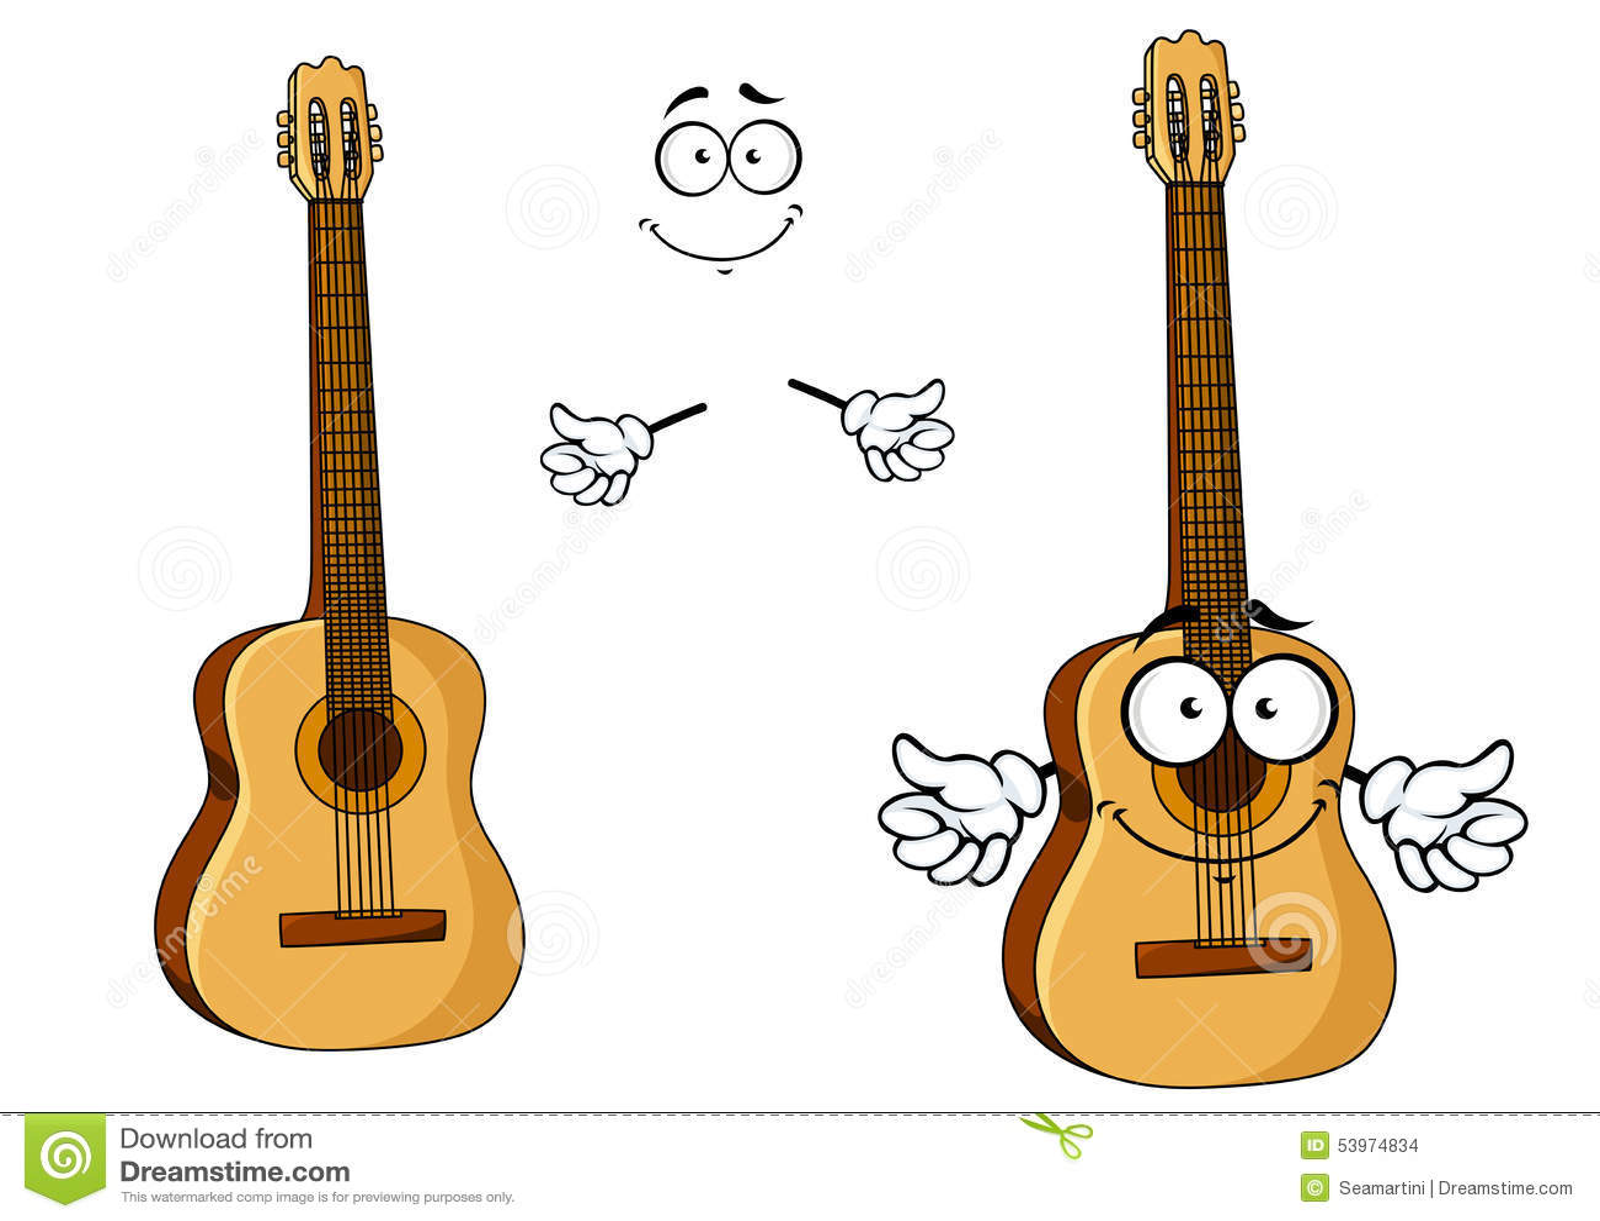 happy cartoon wooden acoustic guitar stock vector illustration of